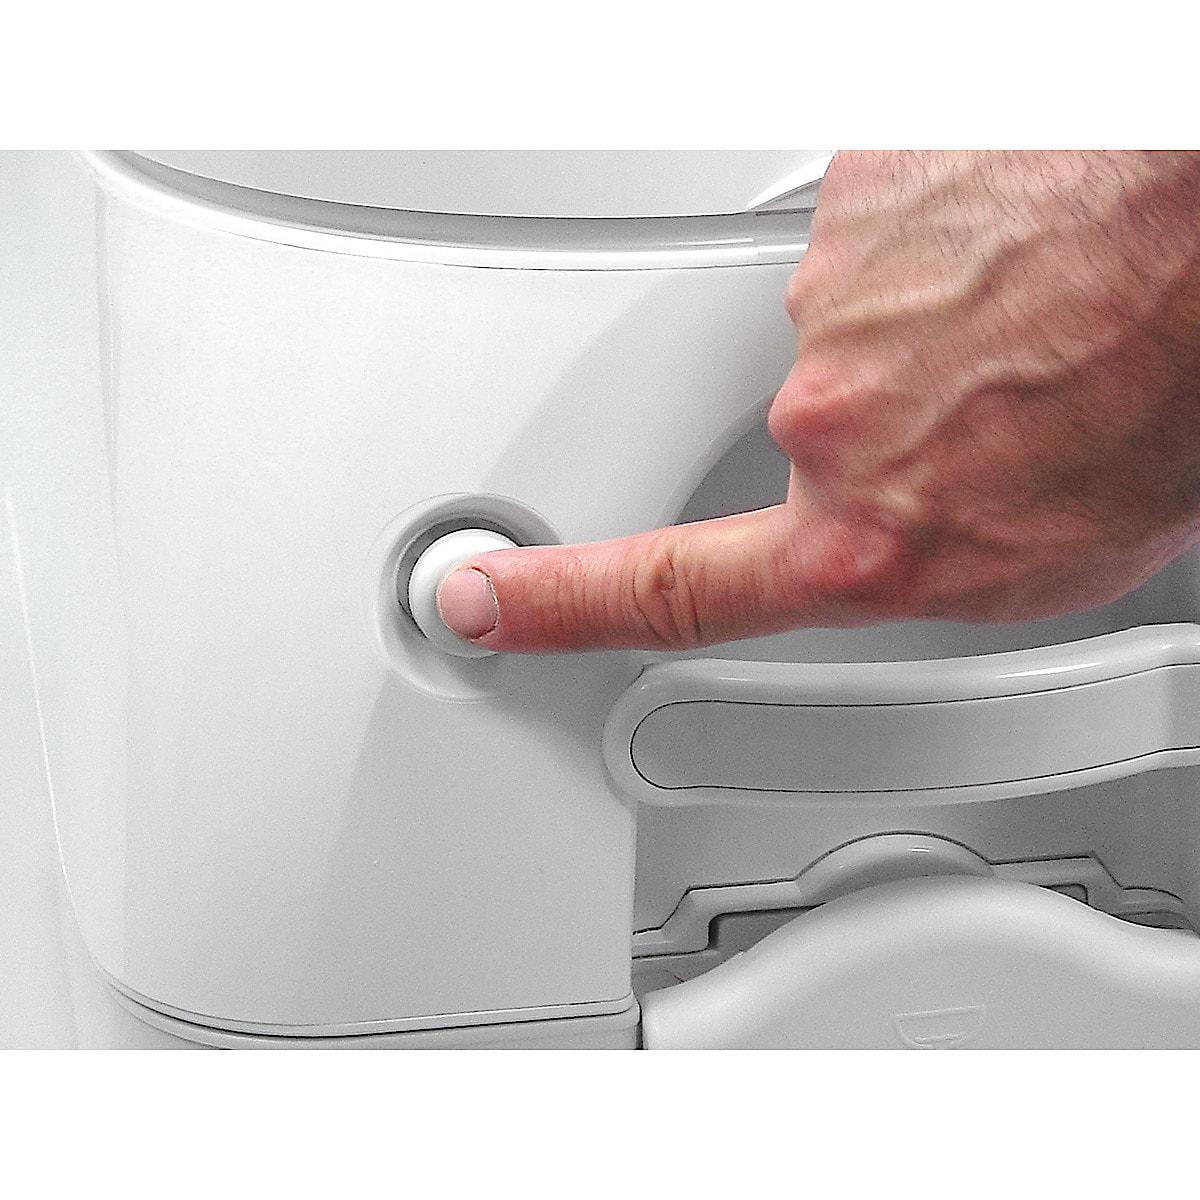 Dometic 976 portabelt toalett